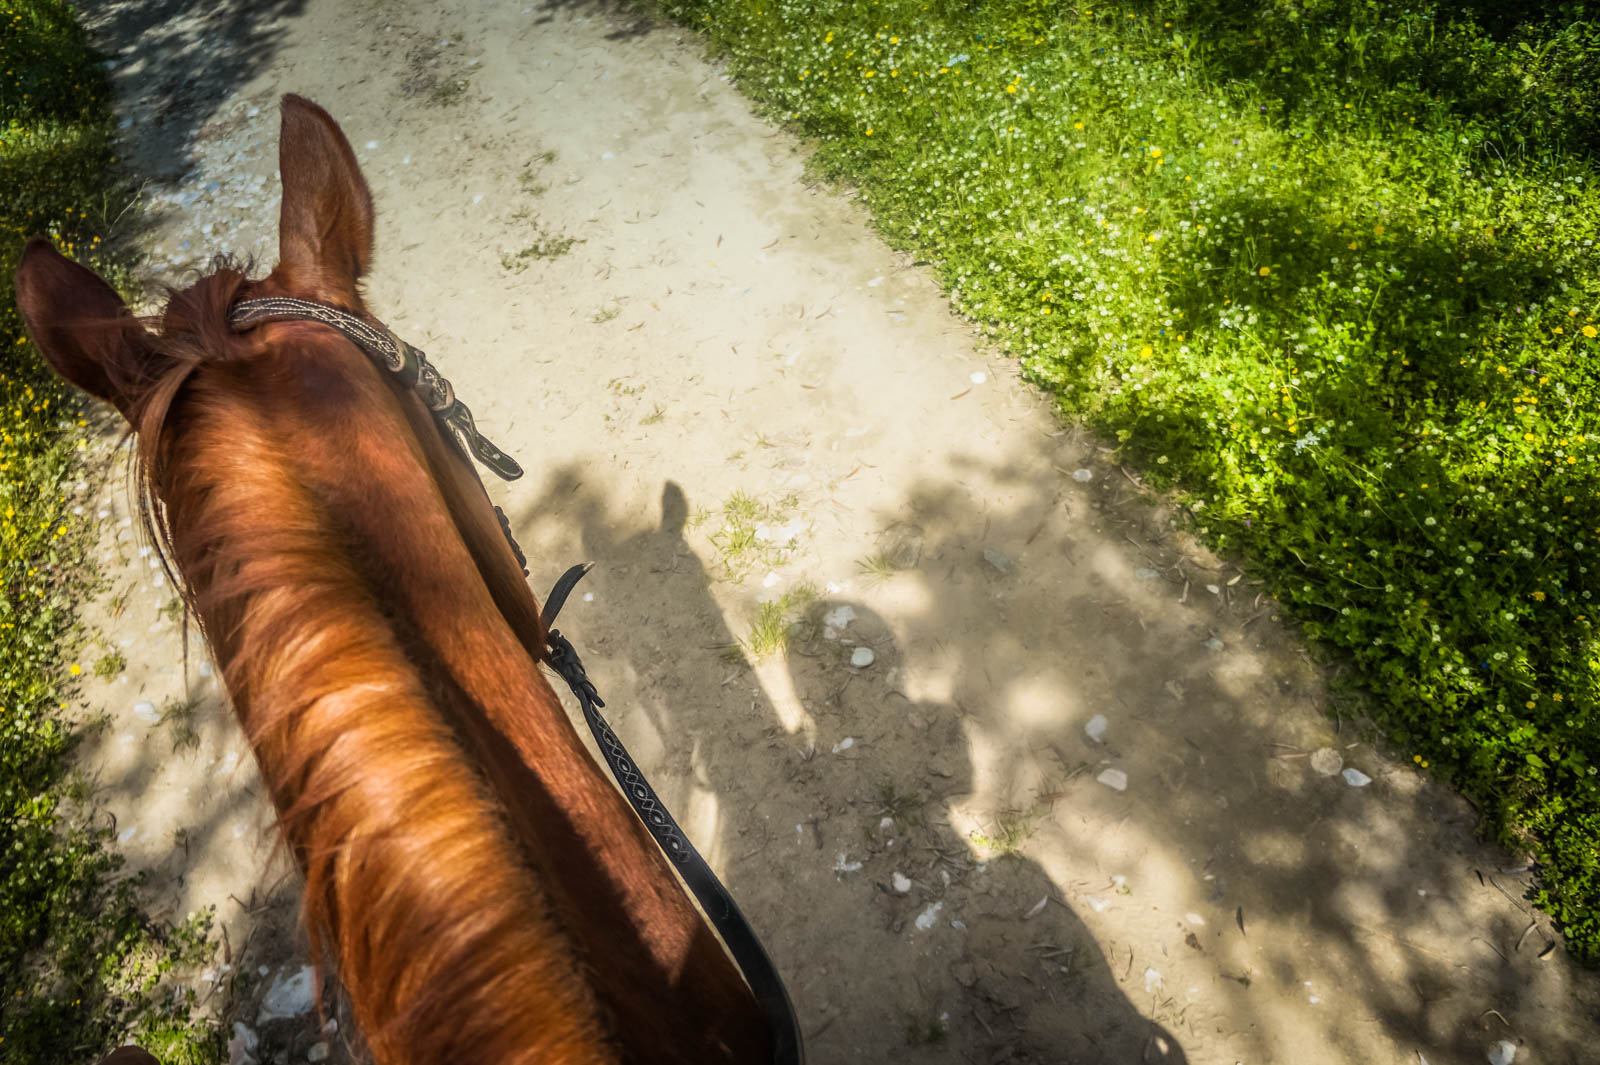 horseback-riding-pelion-greece-la-vie-en-blog-all-rights-reserved-5